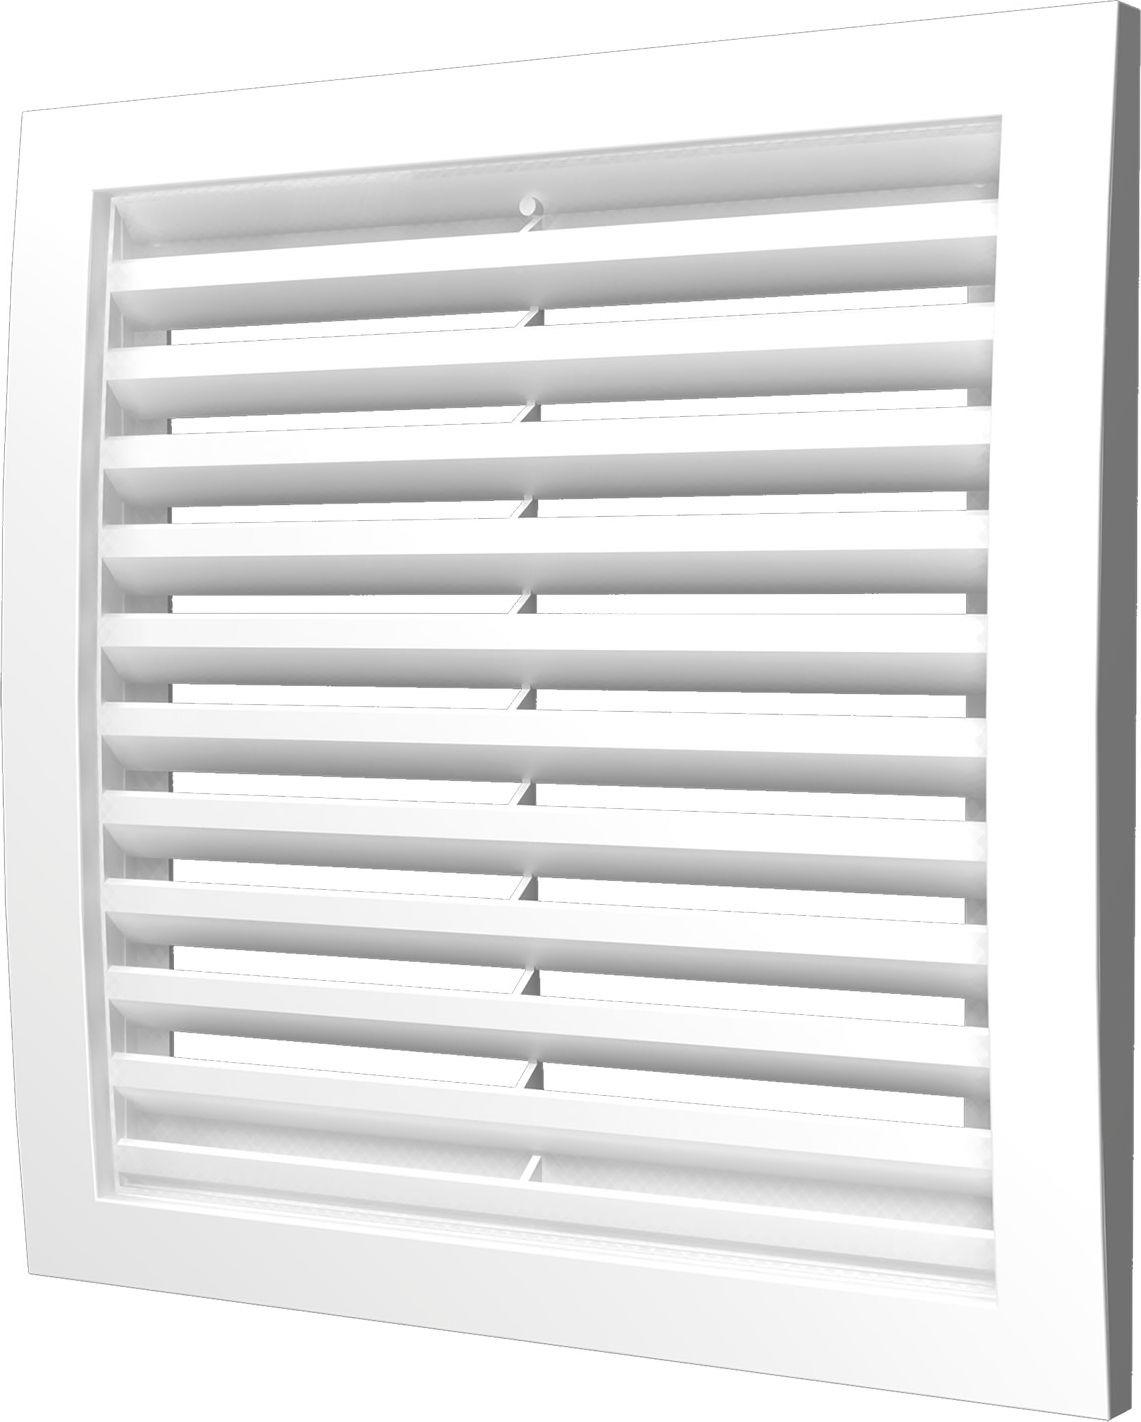 Вентиляционная решетка Street Line, 2525РРН, белый, наружная, 25 х см